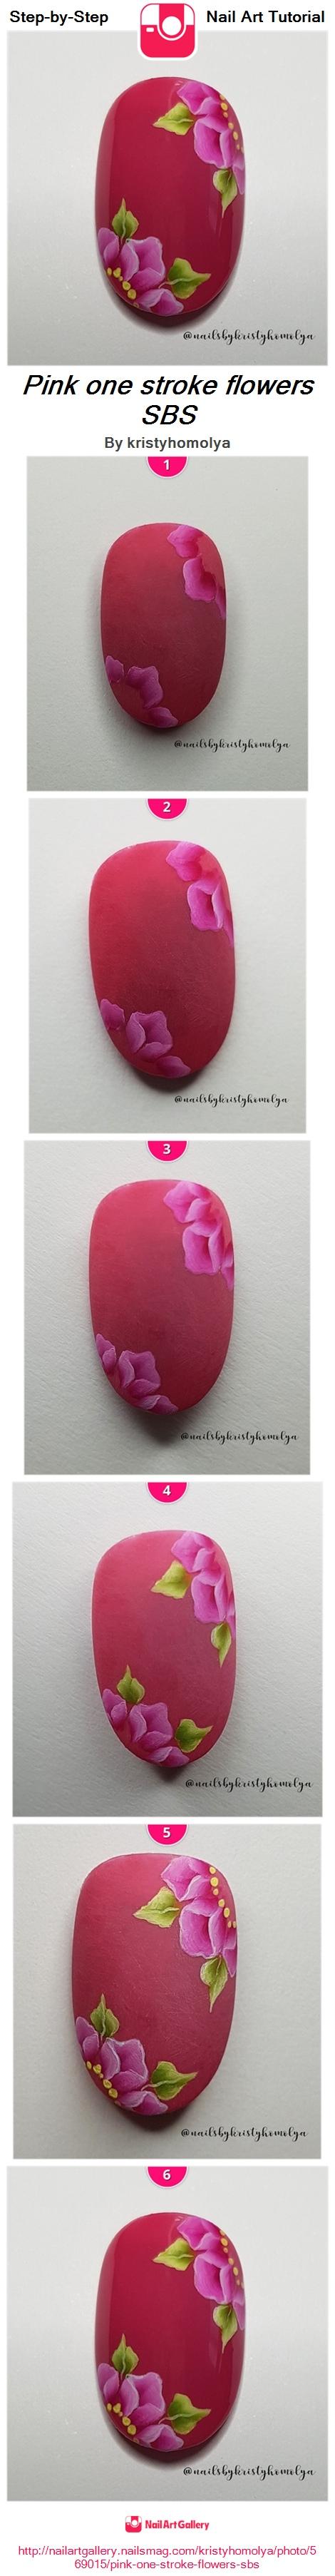 Pink one stroke flowers SBS - Nail Art Gallery